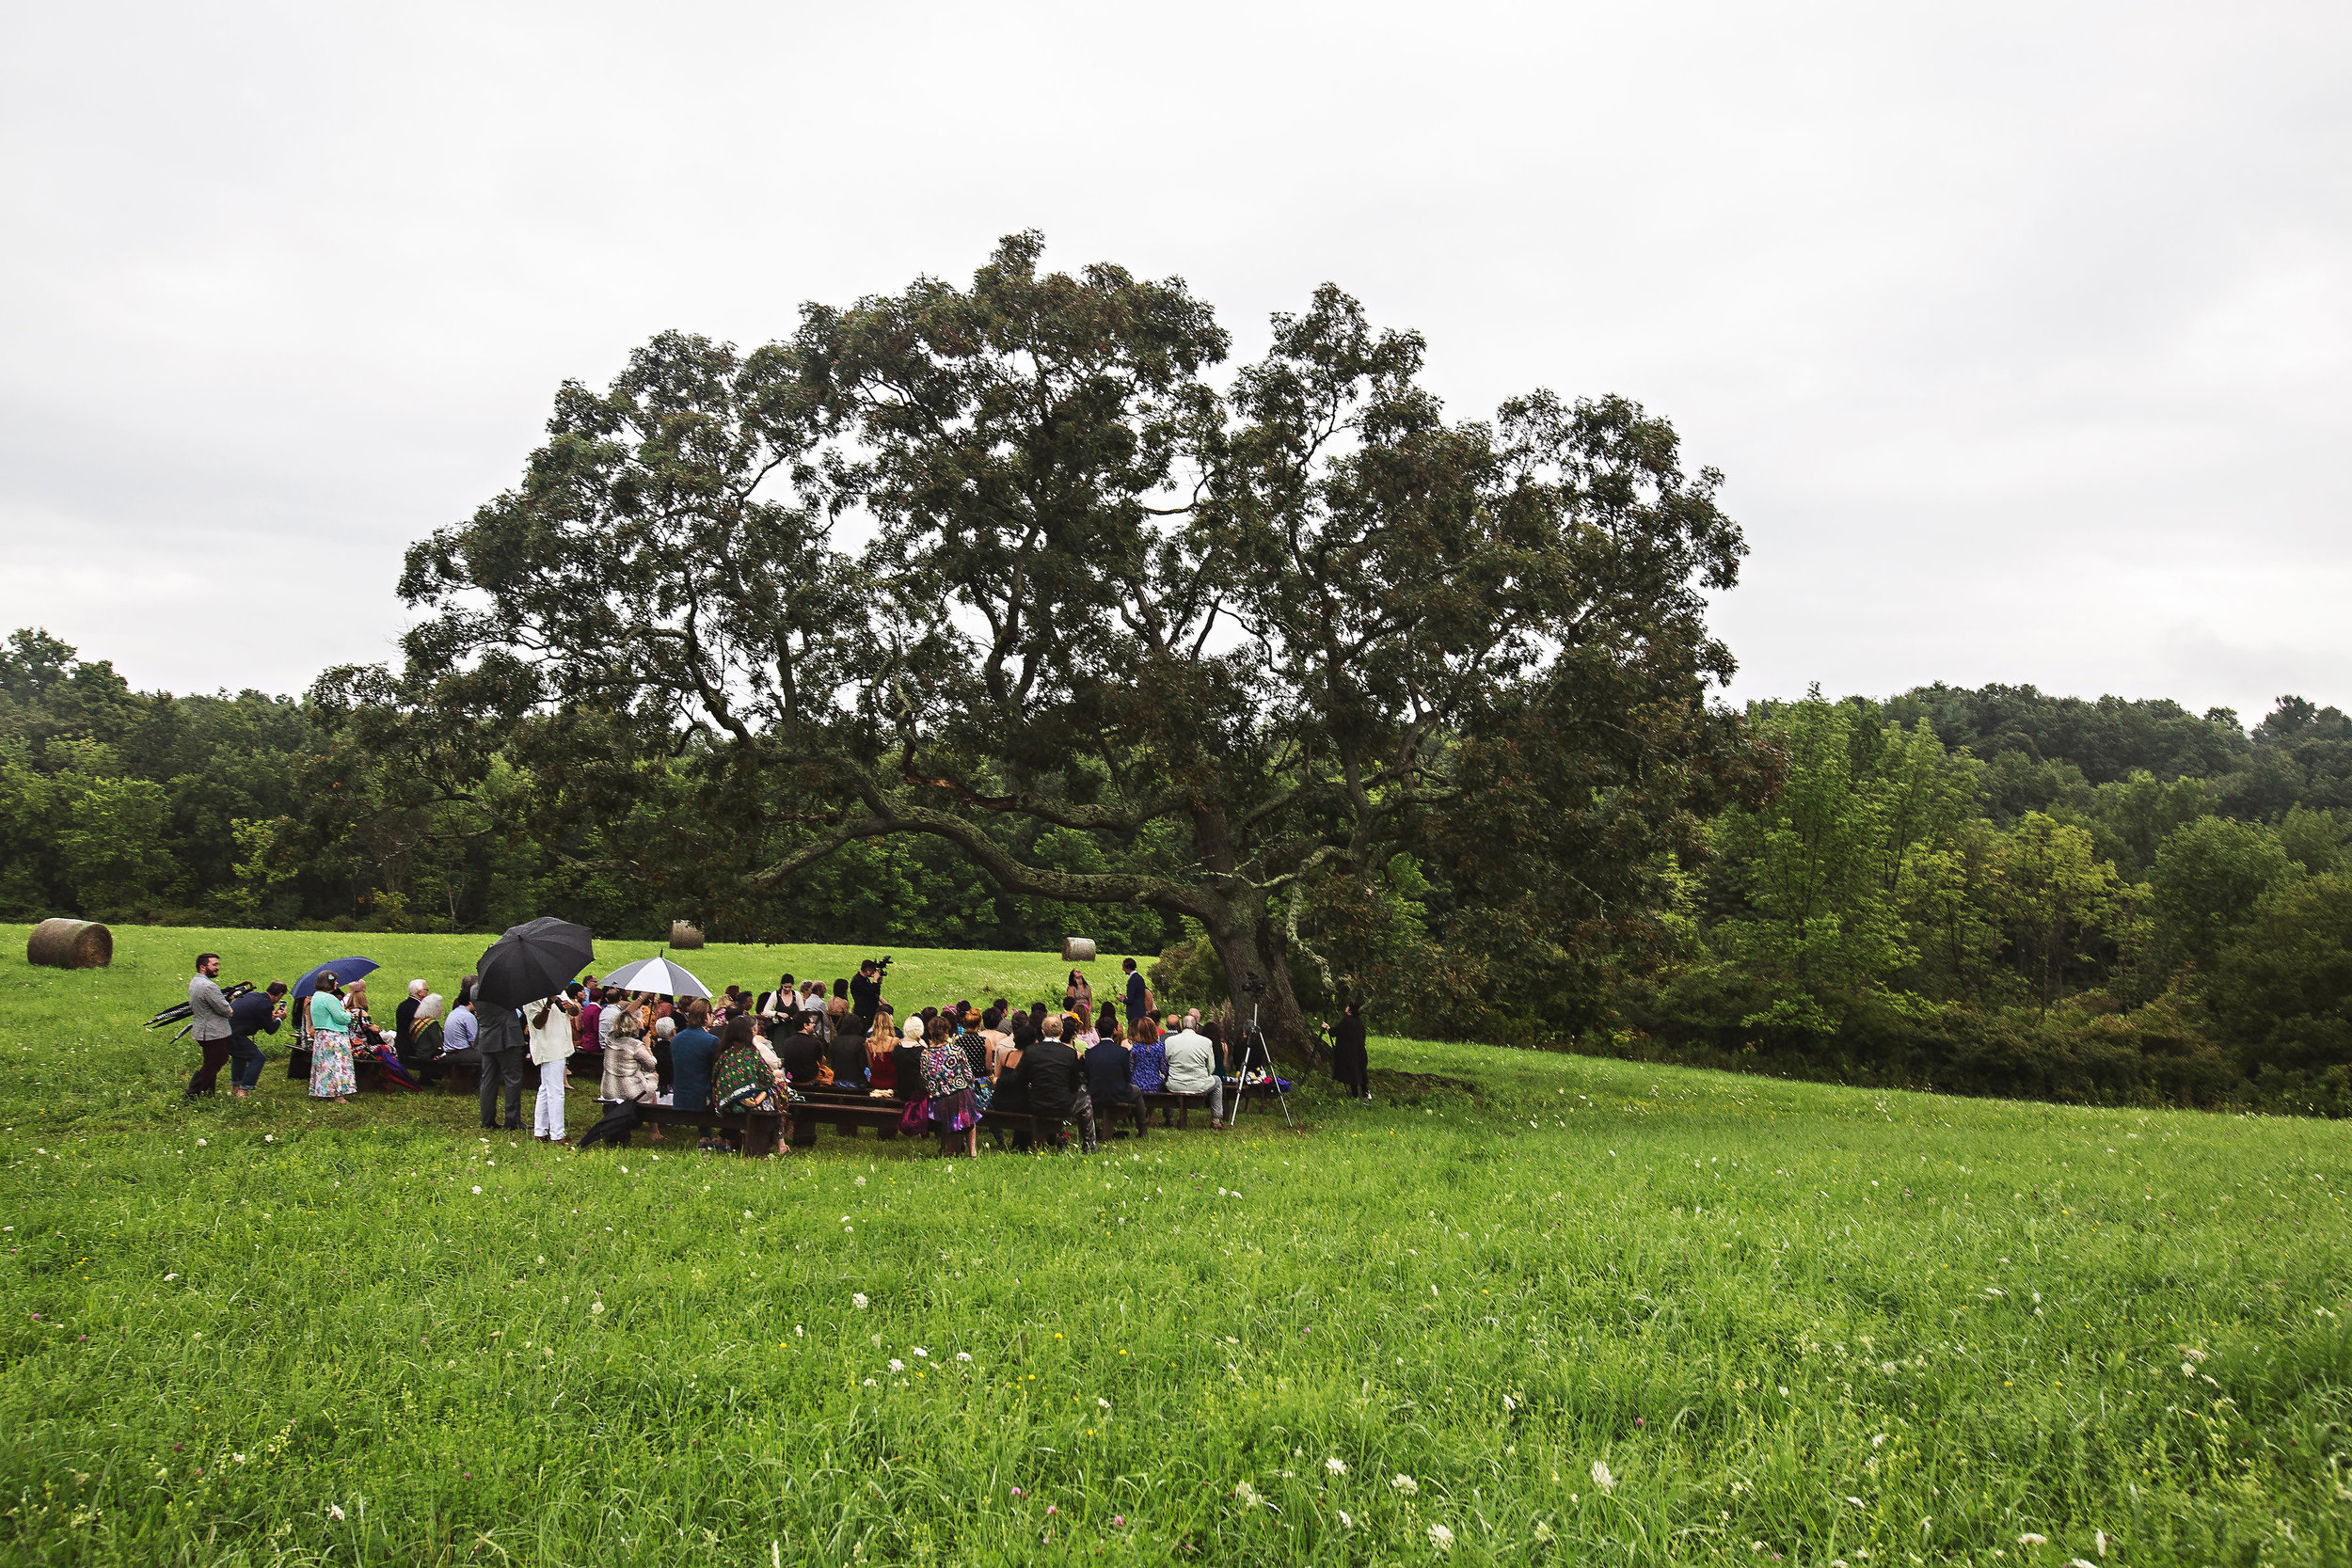 upstate-ny-wedding-jove-meyer-events-inbal-sivan-014.jpg